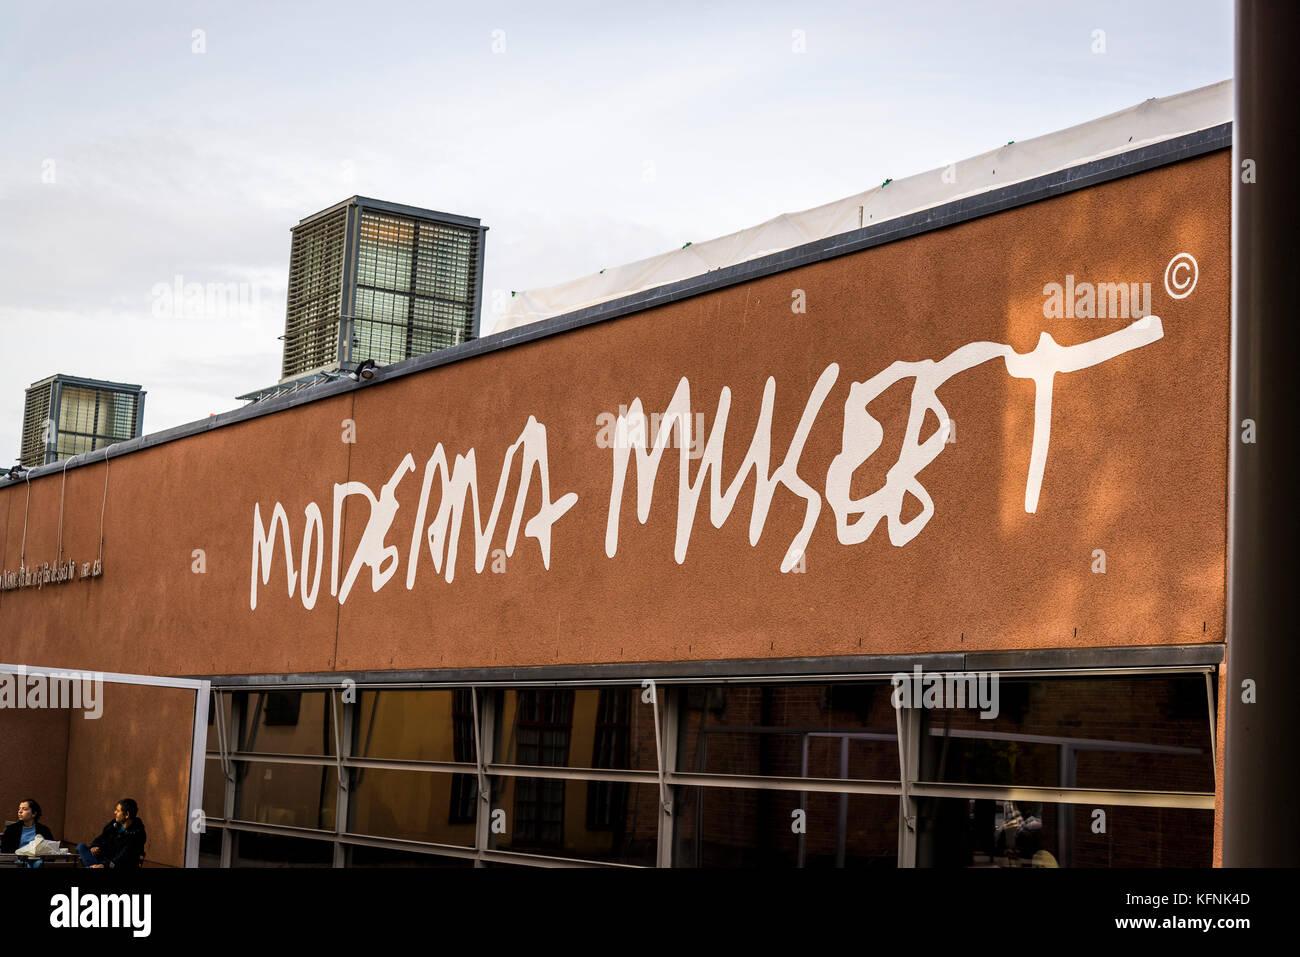 Moderna Museet Museum For Modern And Contemporary Art